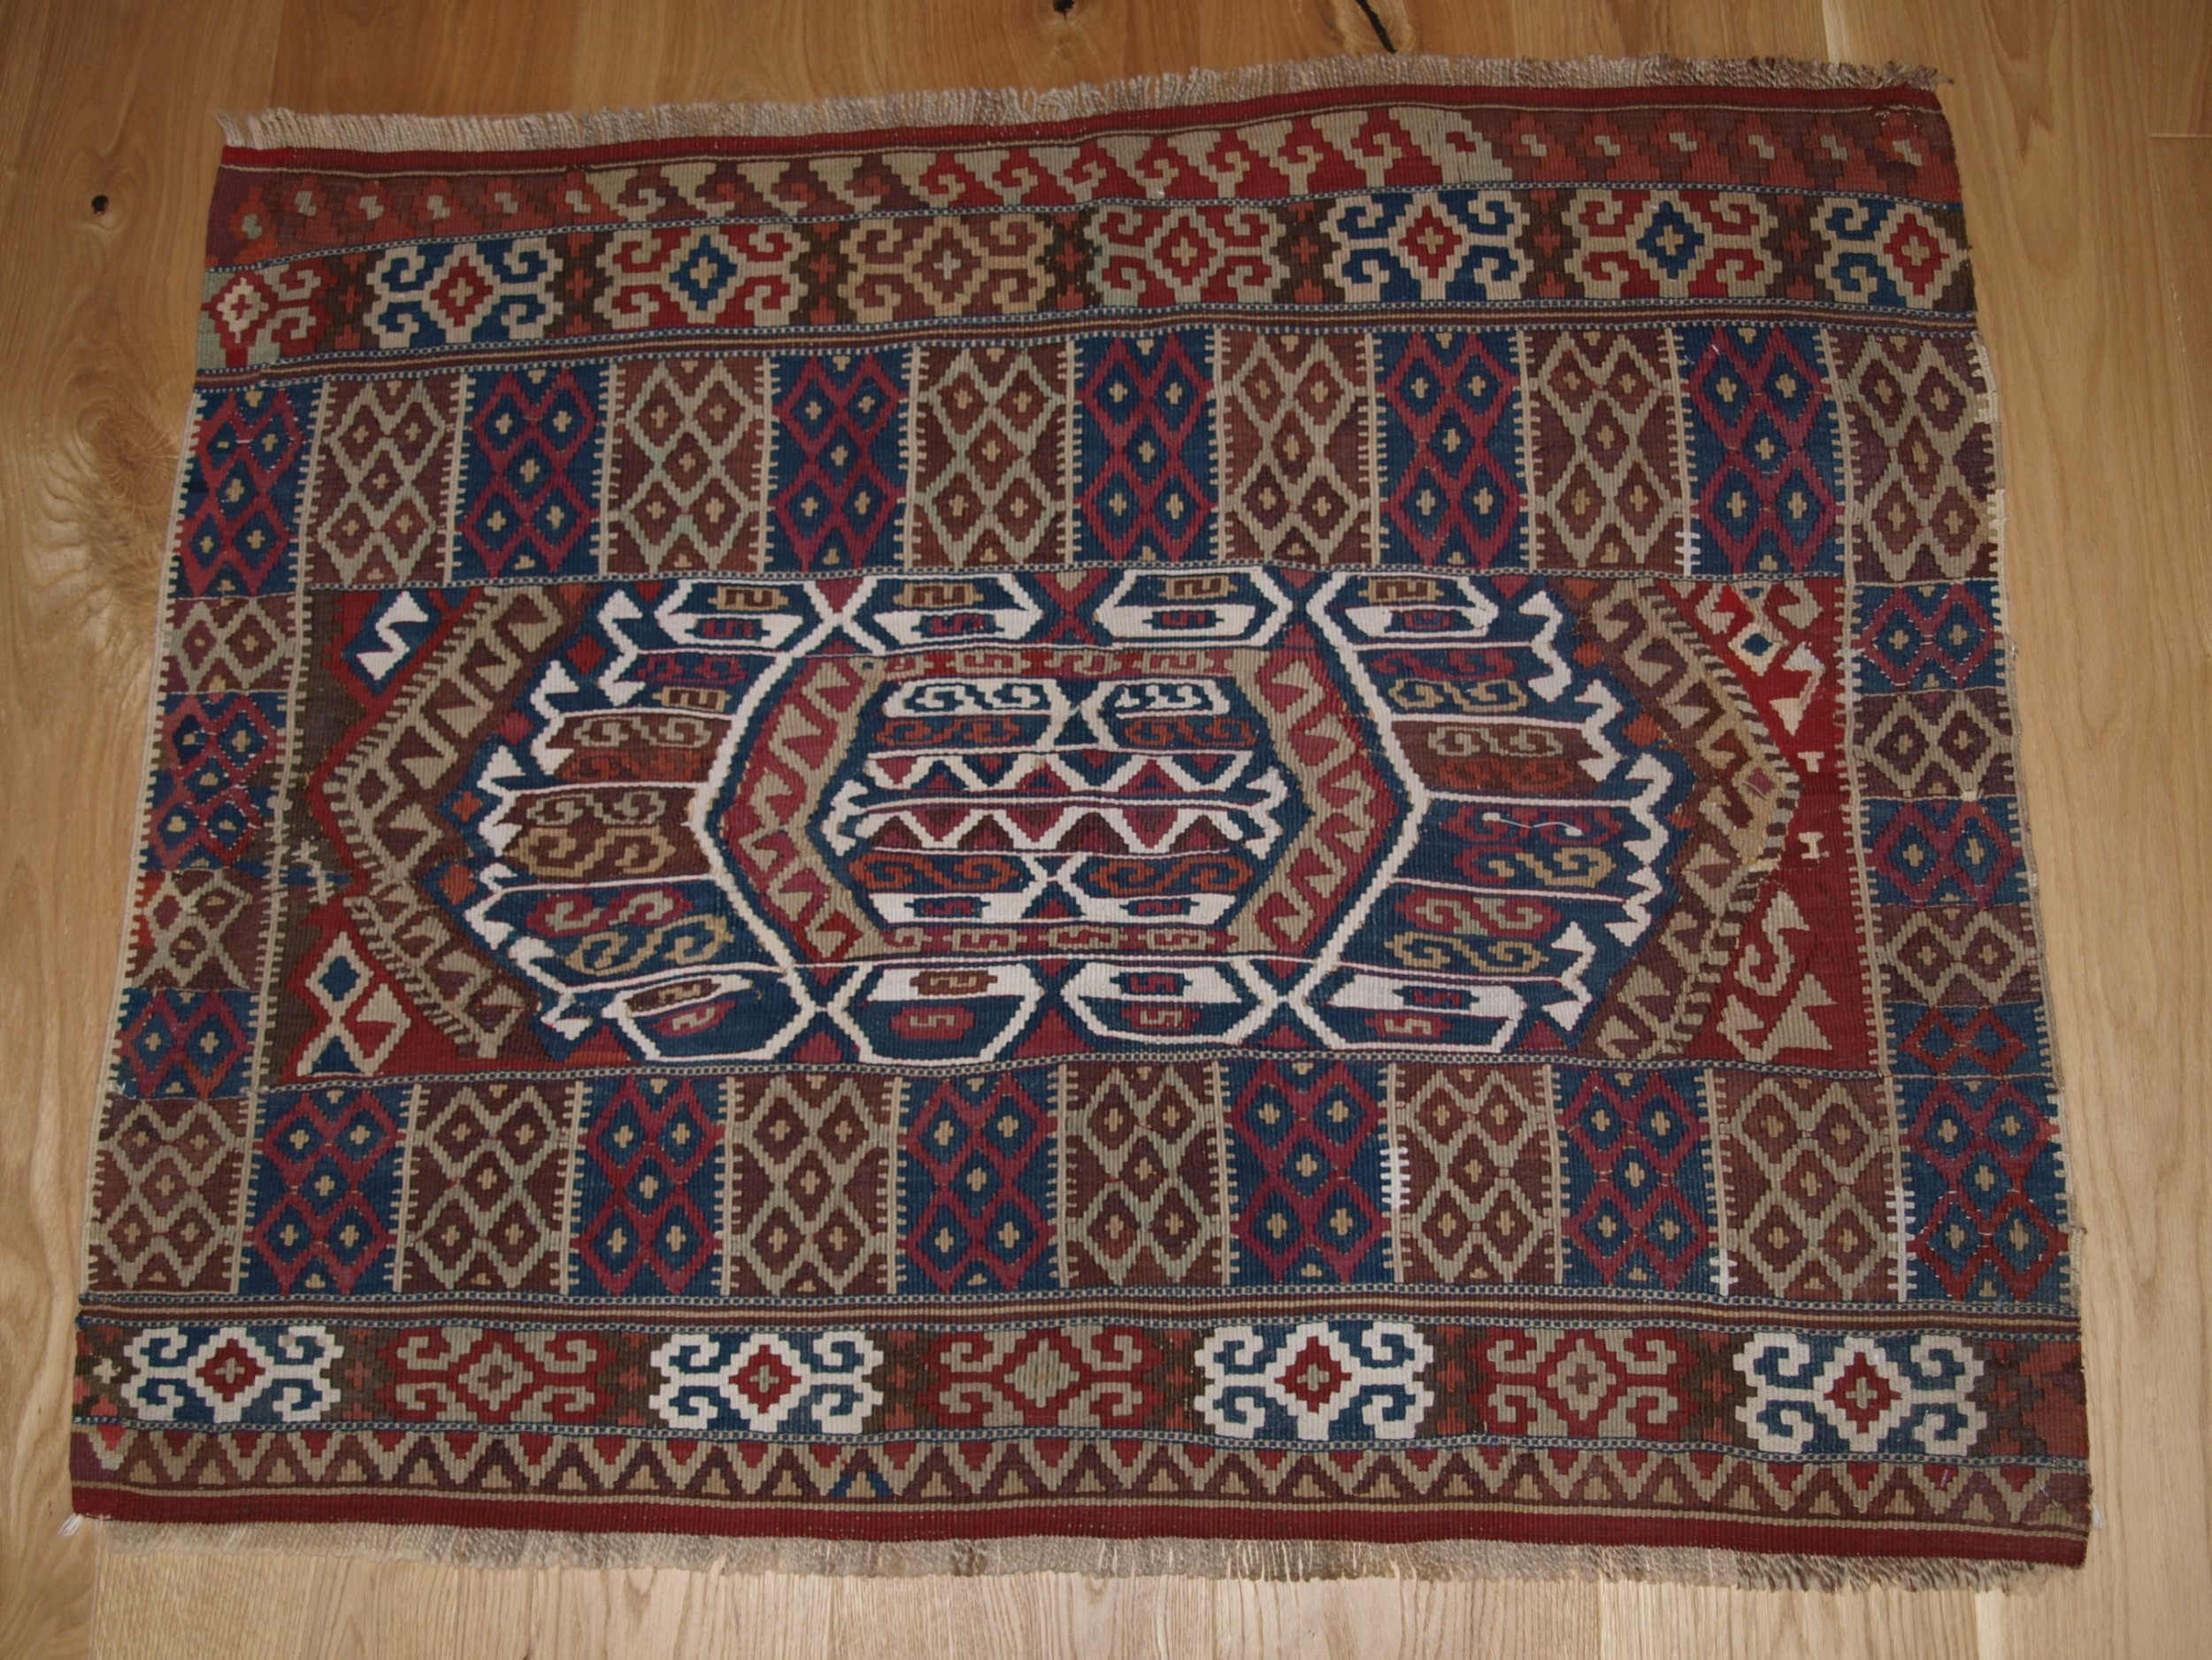 antique turkish malatya kilim bag or chuval face excellent condition circa 1900